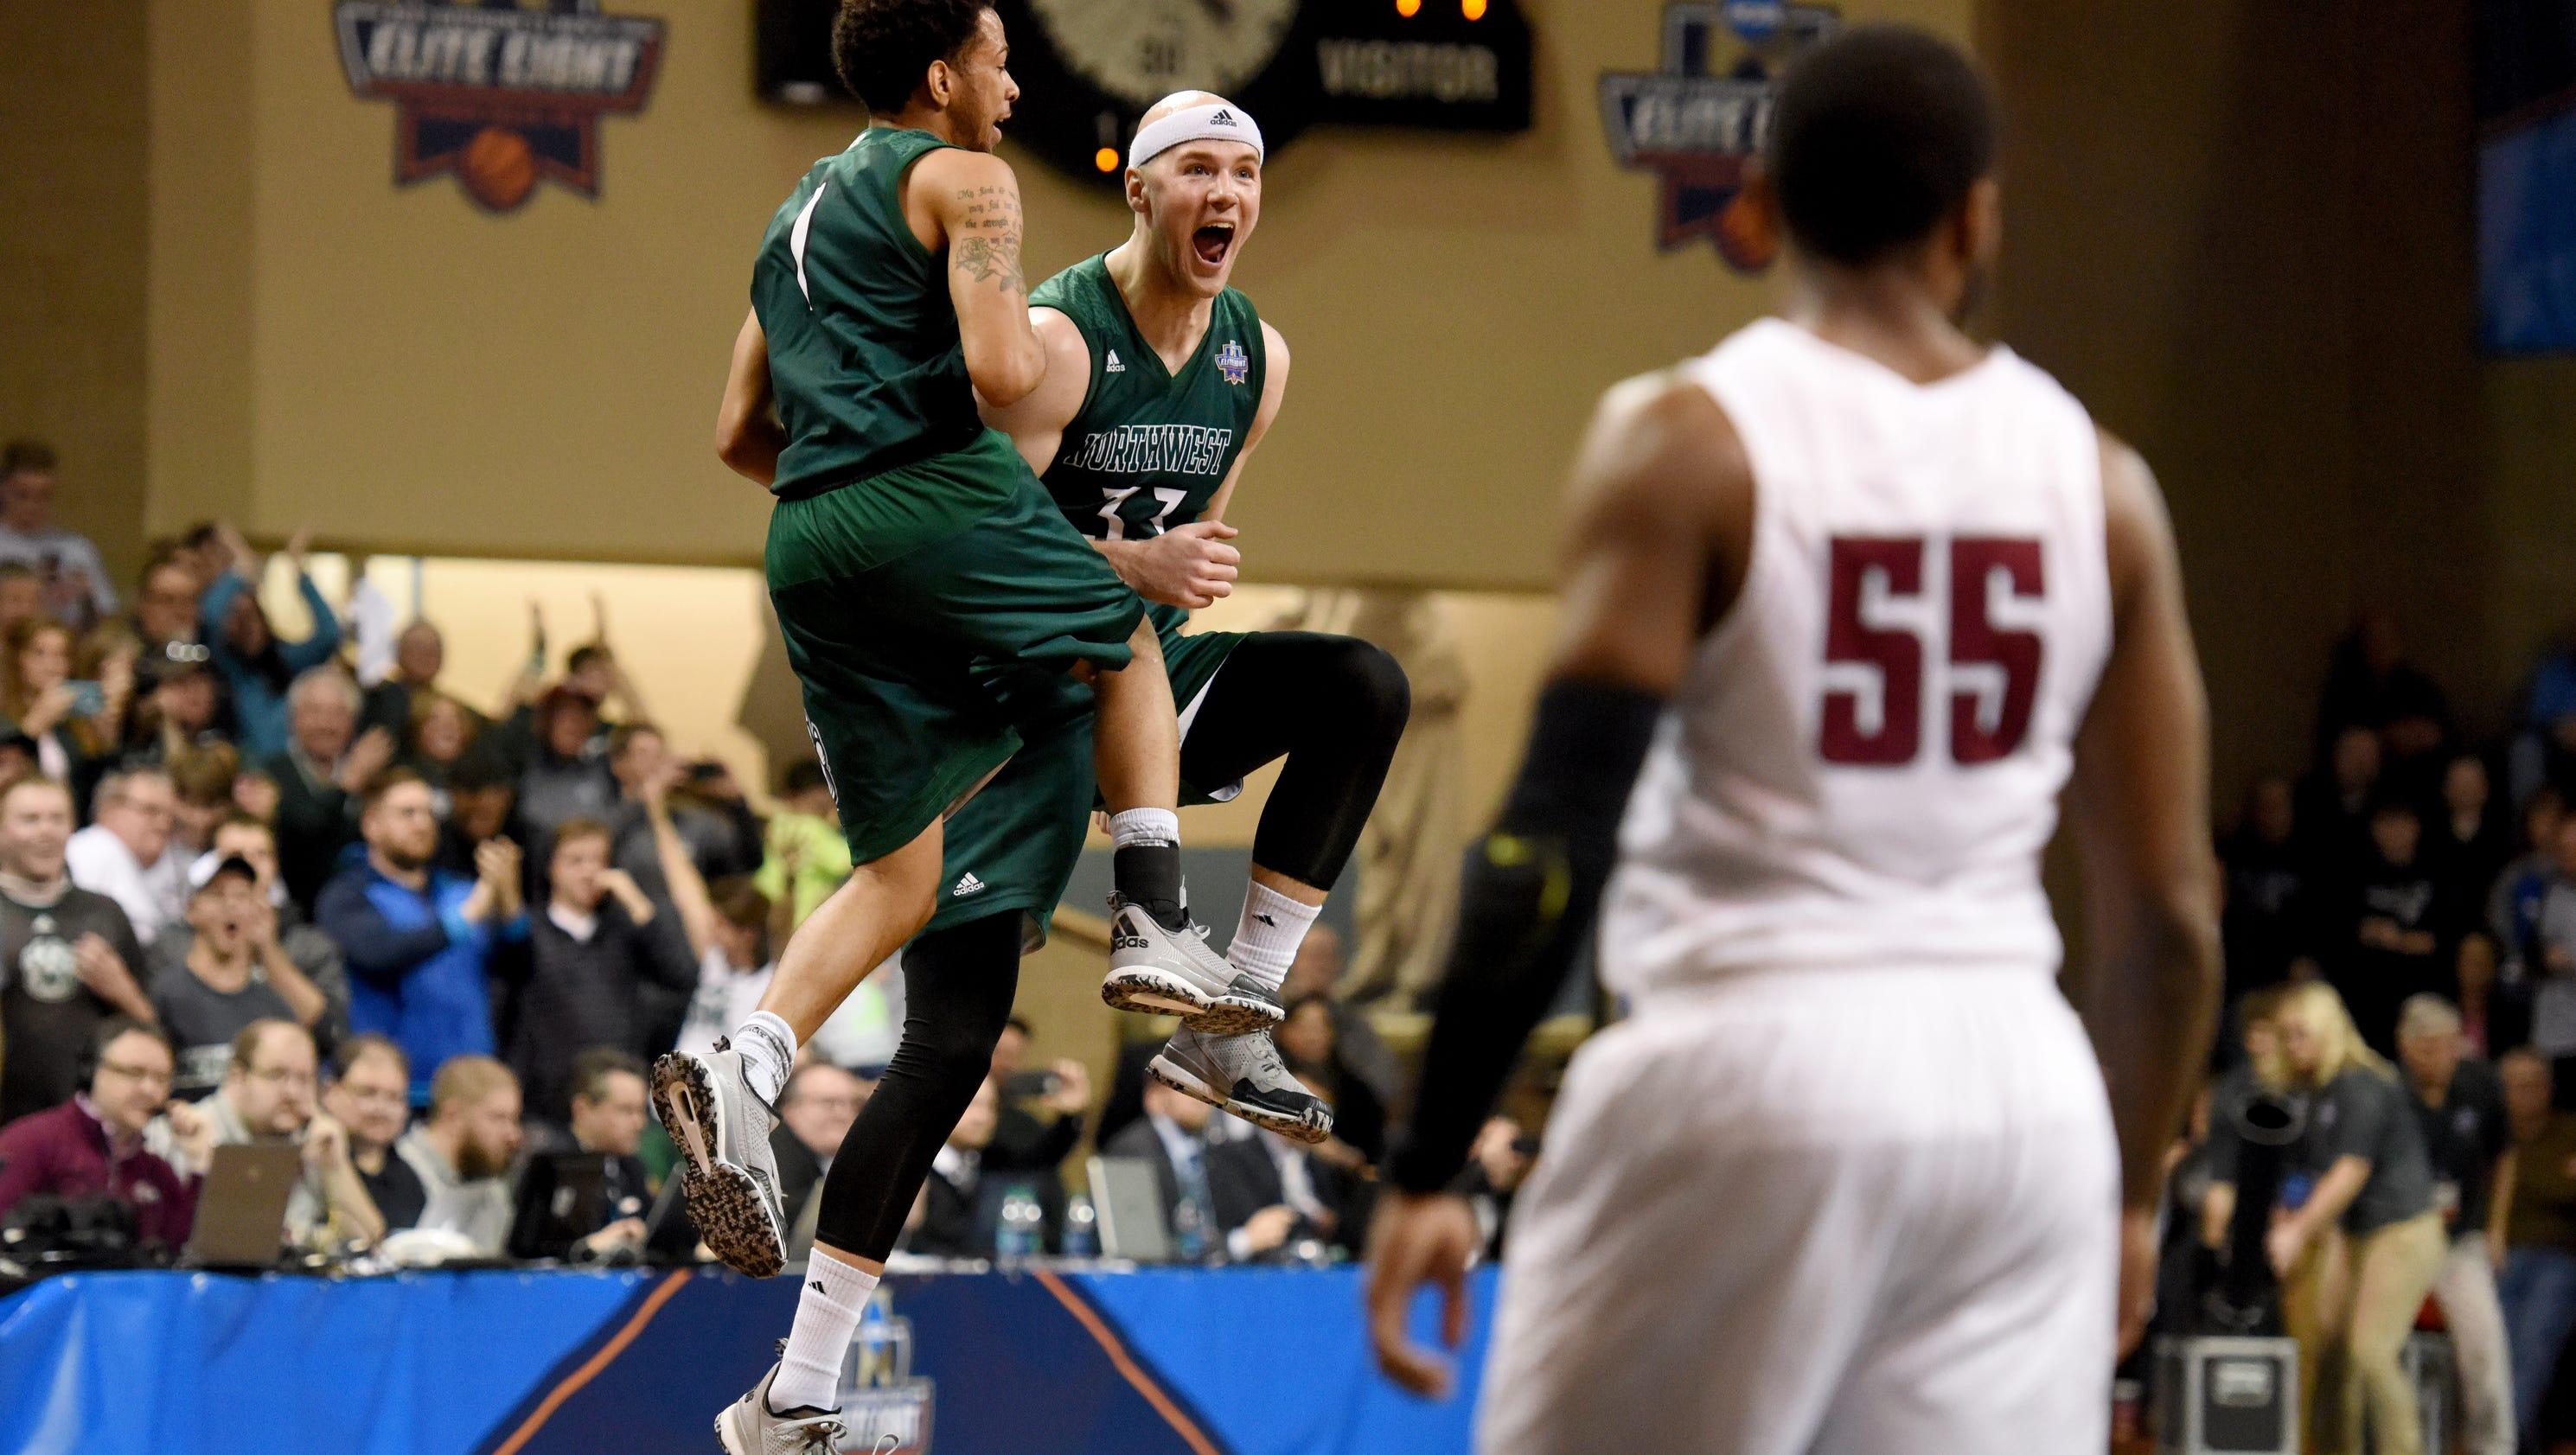 Photos: NCAA Division II Men's Elite Eight Championship